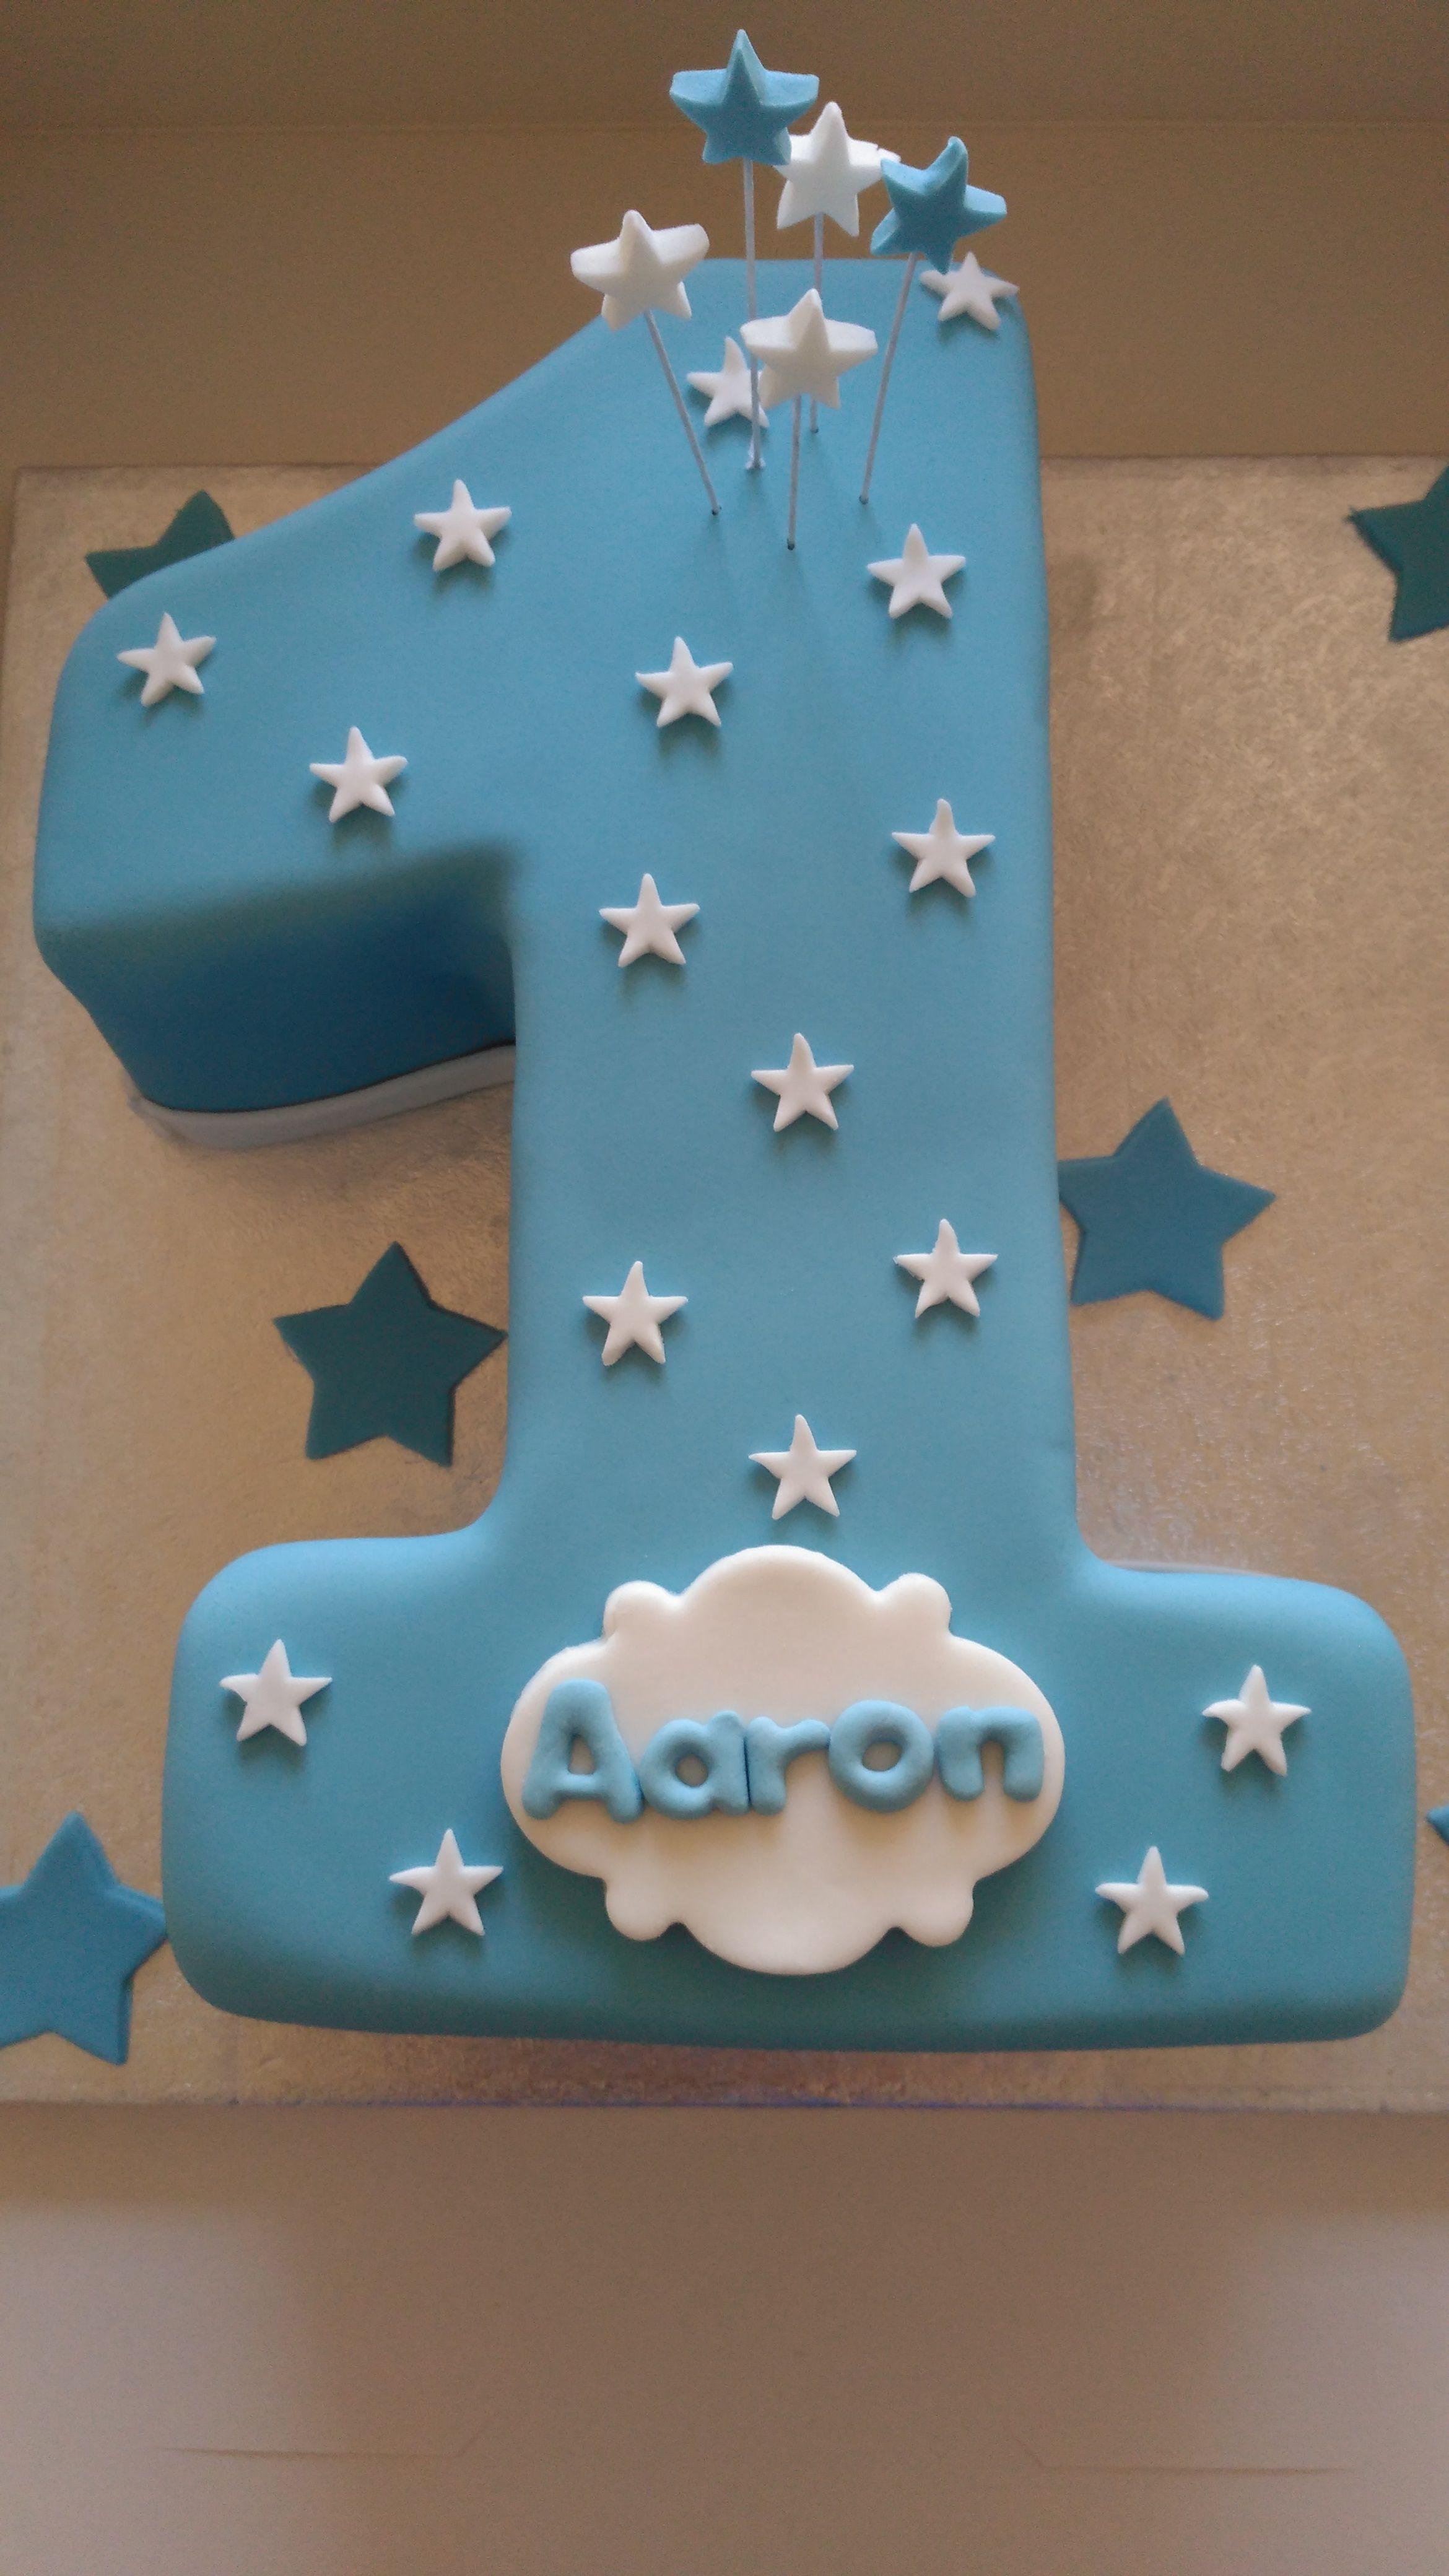 Surprising 32 Brilliant Picture Of Birthday Cakes For Boys Birijus Com Personalised Birthday Cards Beptaeletsinfo